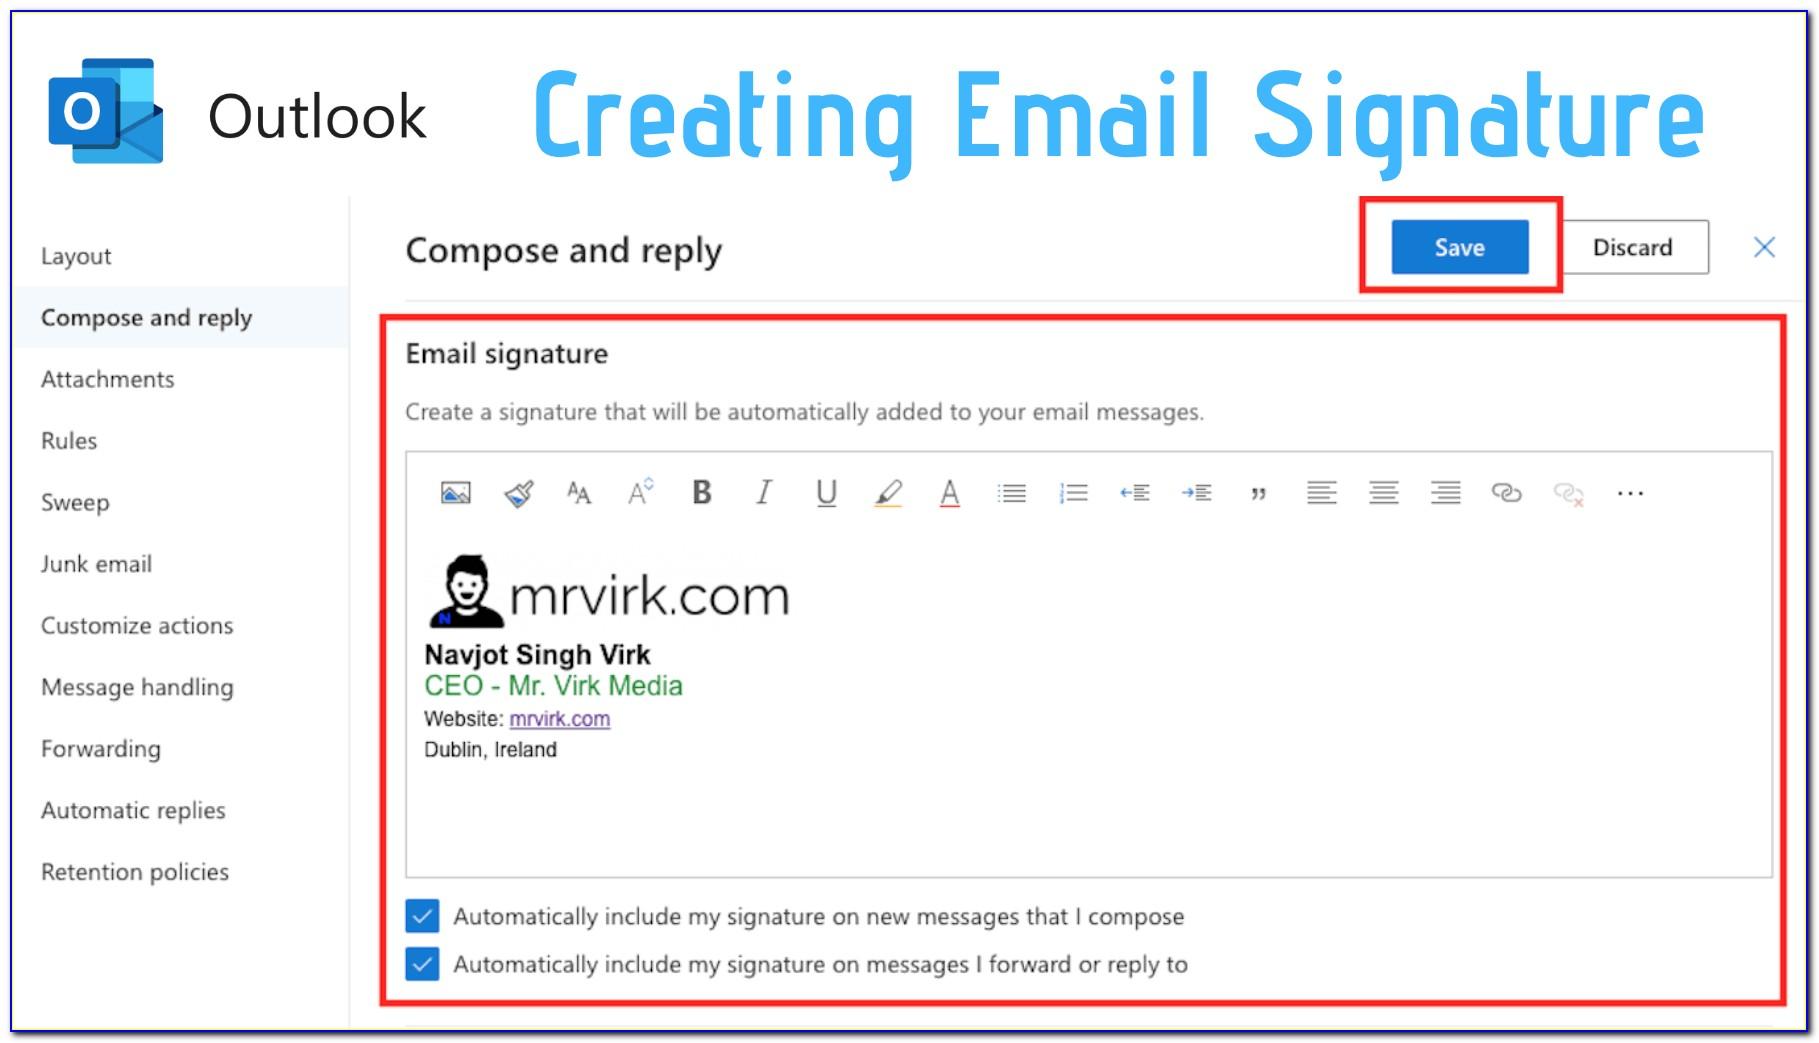 Professional Email Signature Free Templates